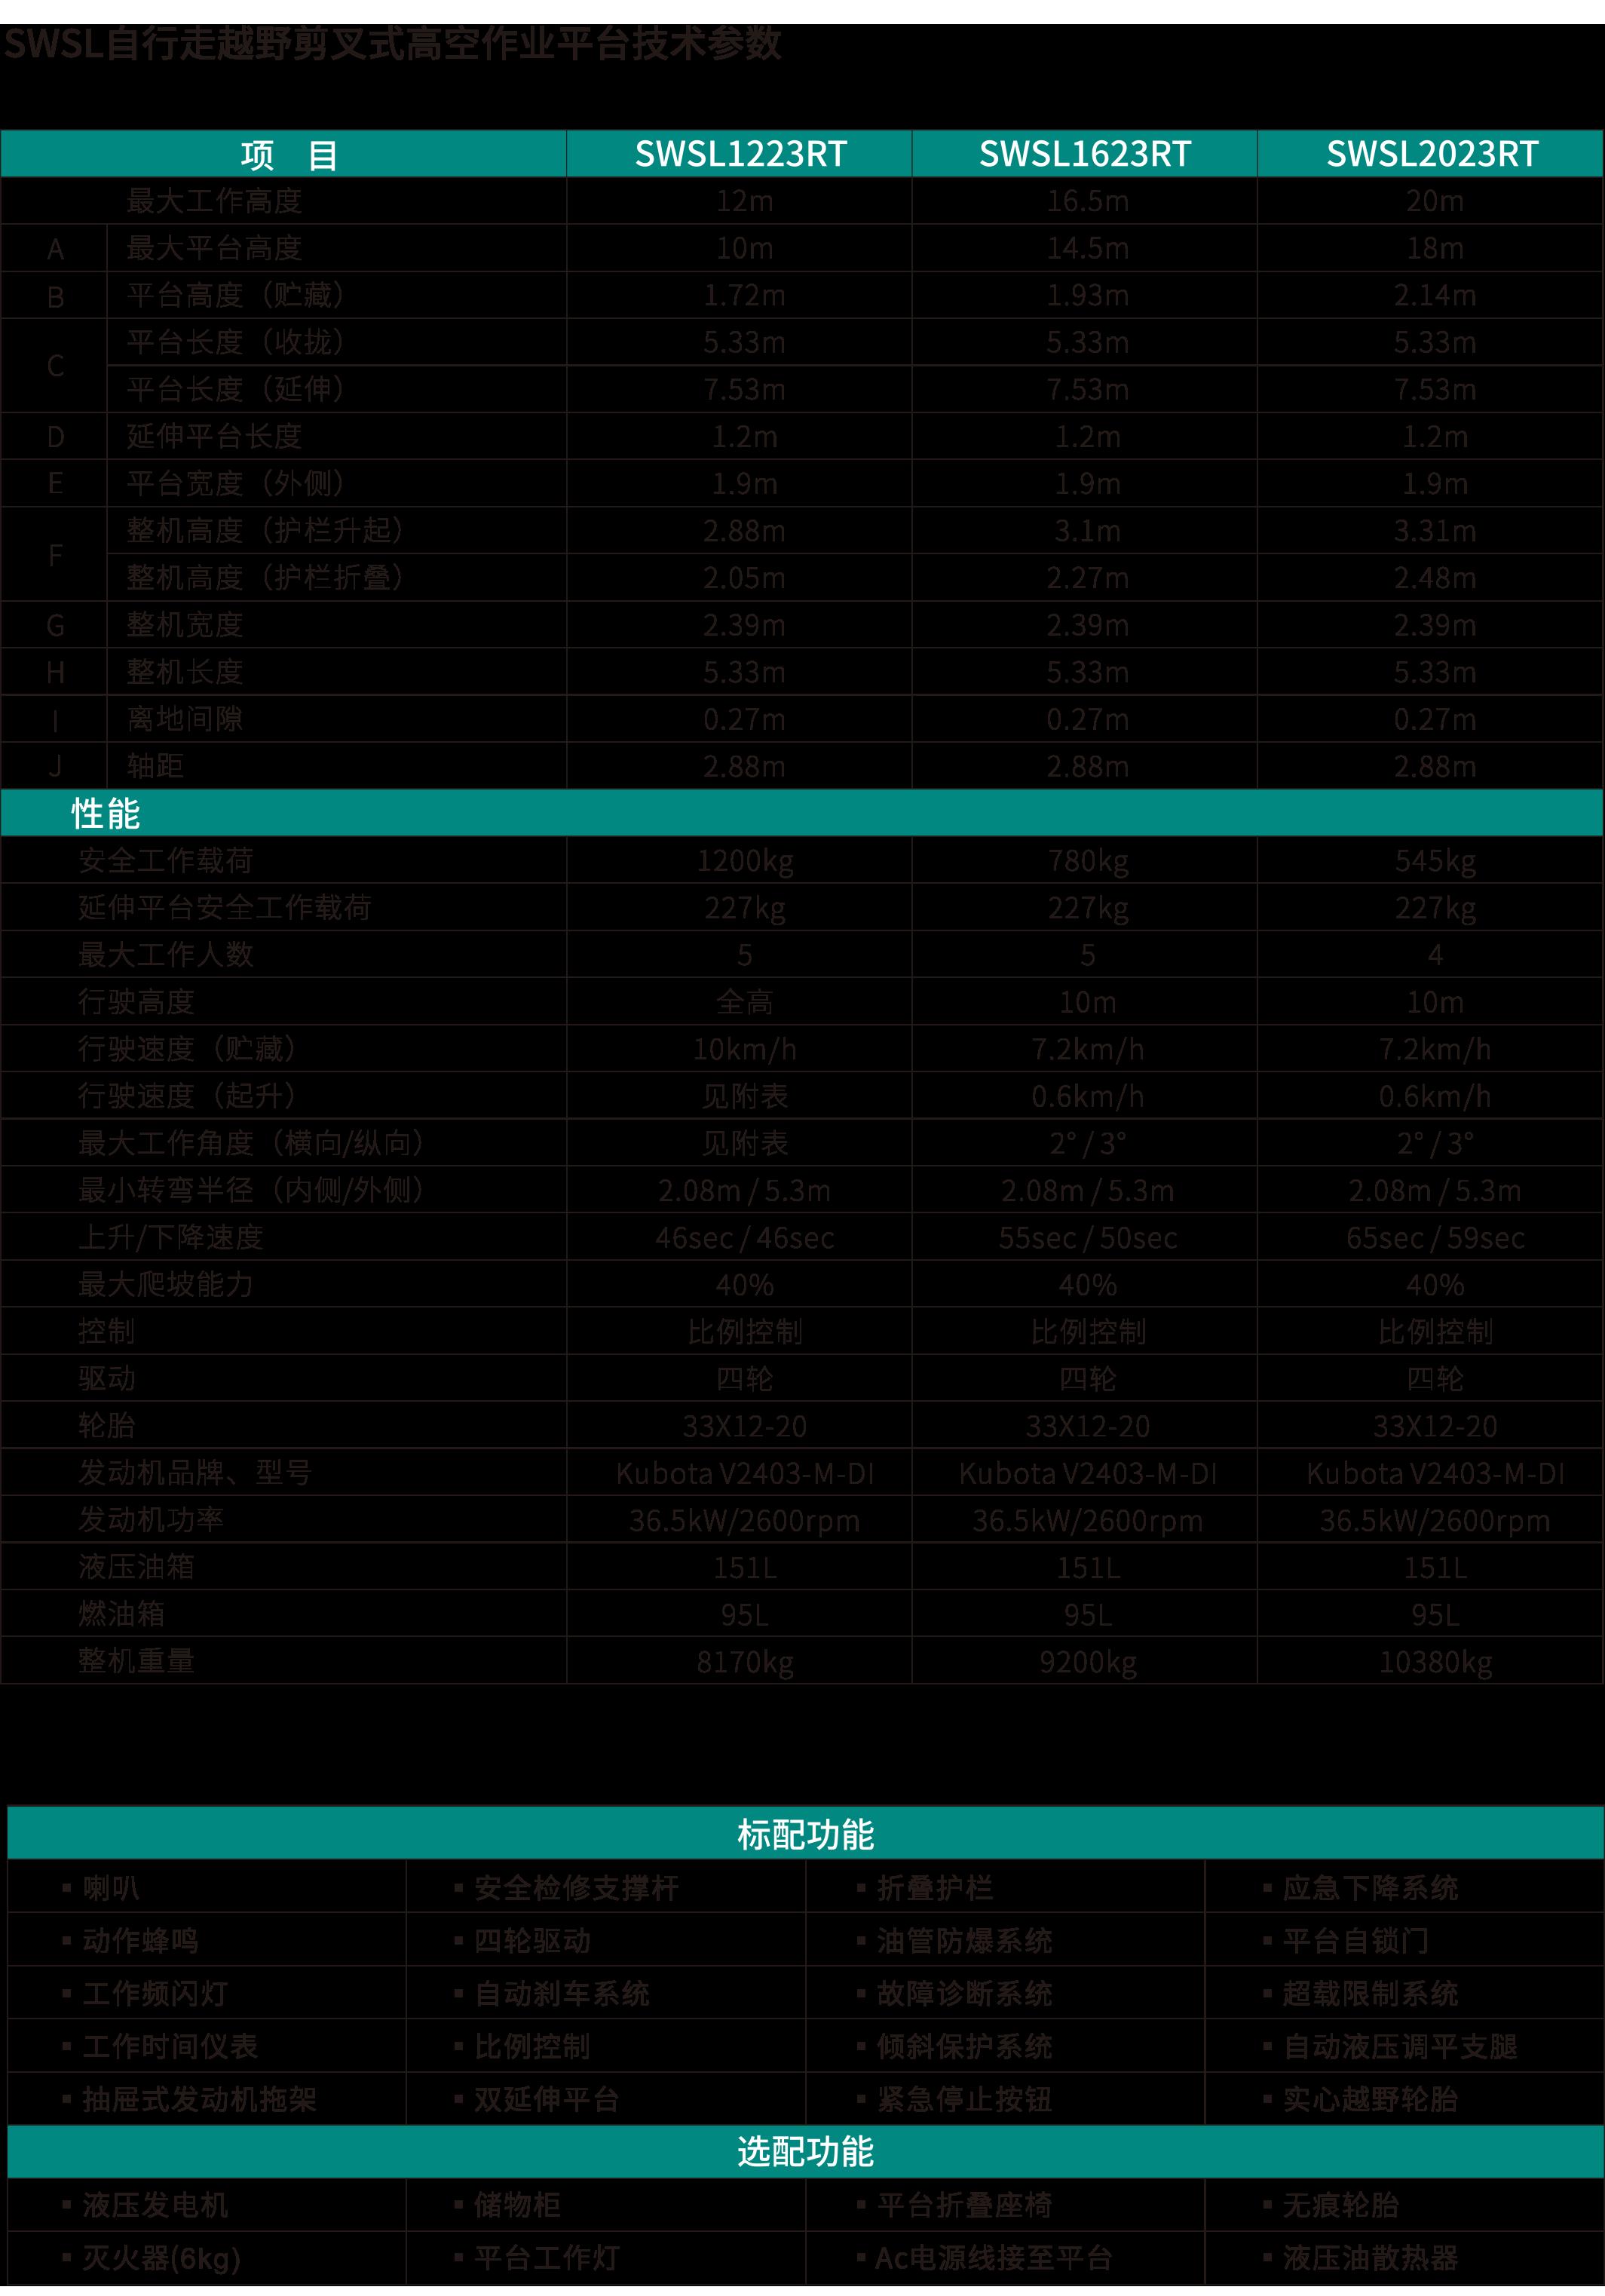 SWSL2023RT 越野剪叉式高空作业平台